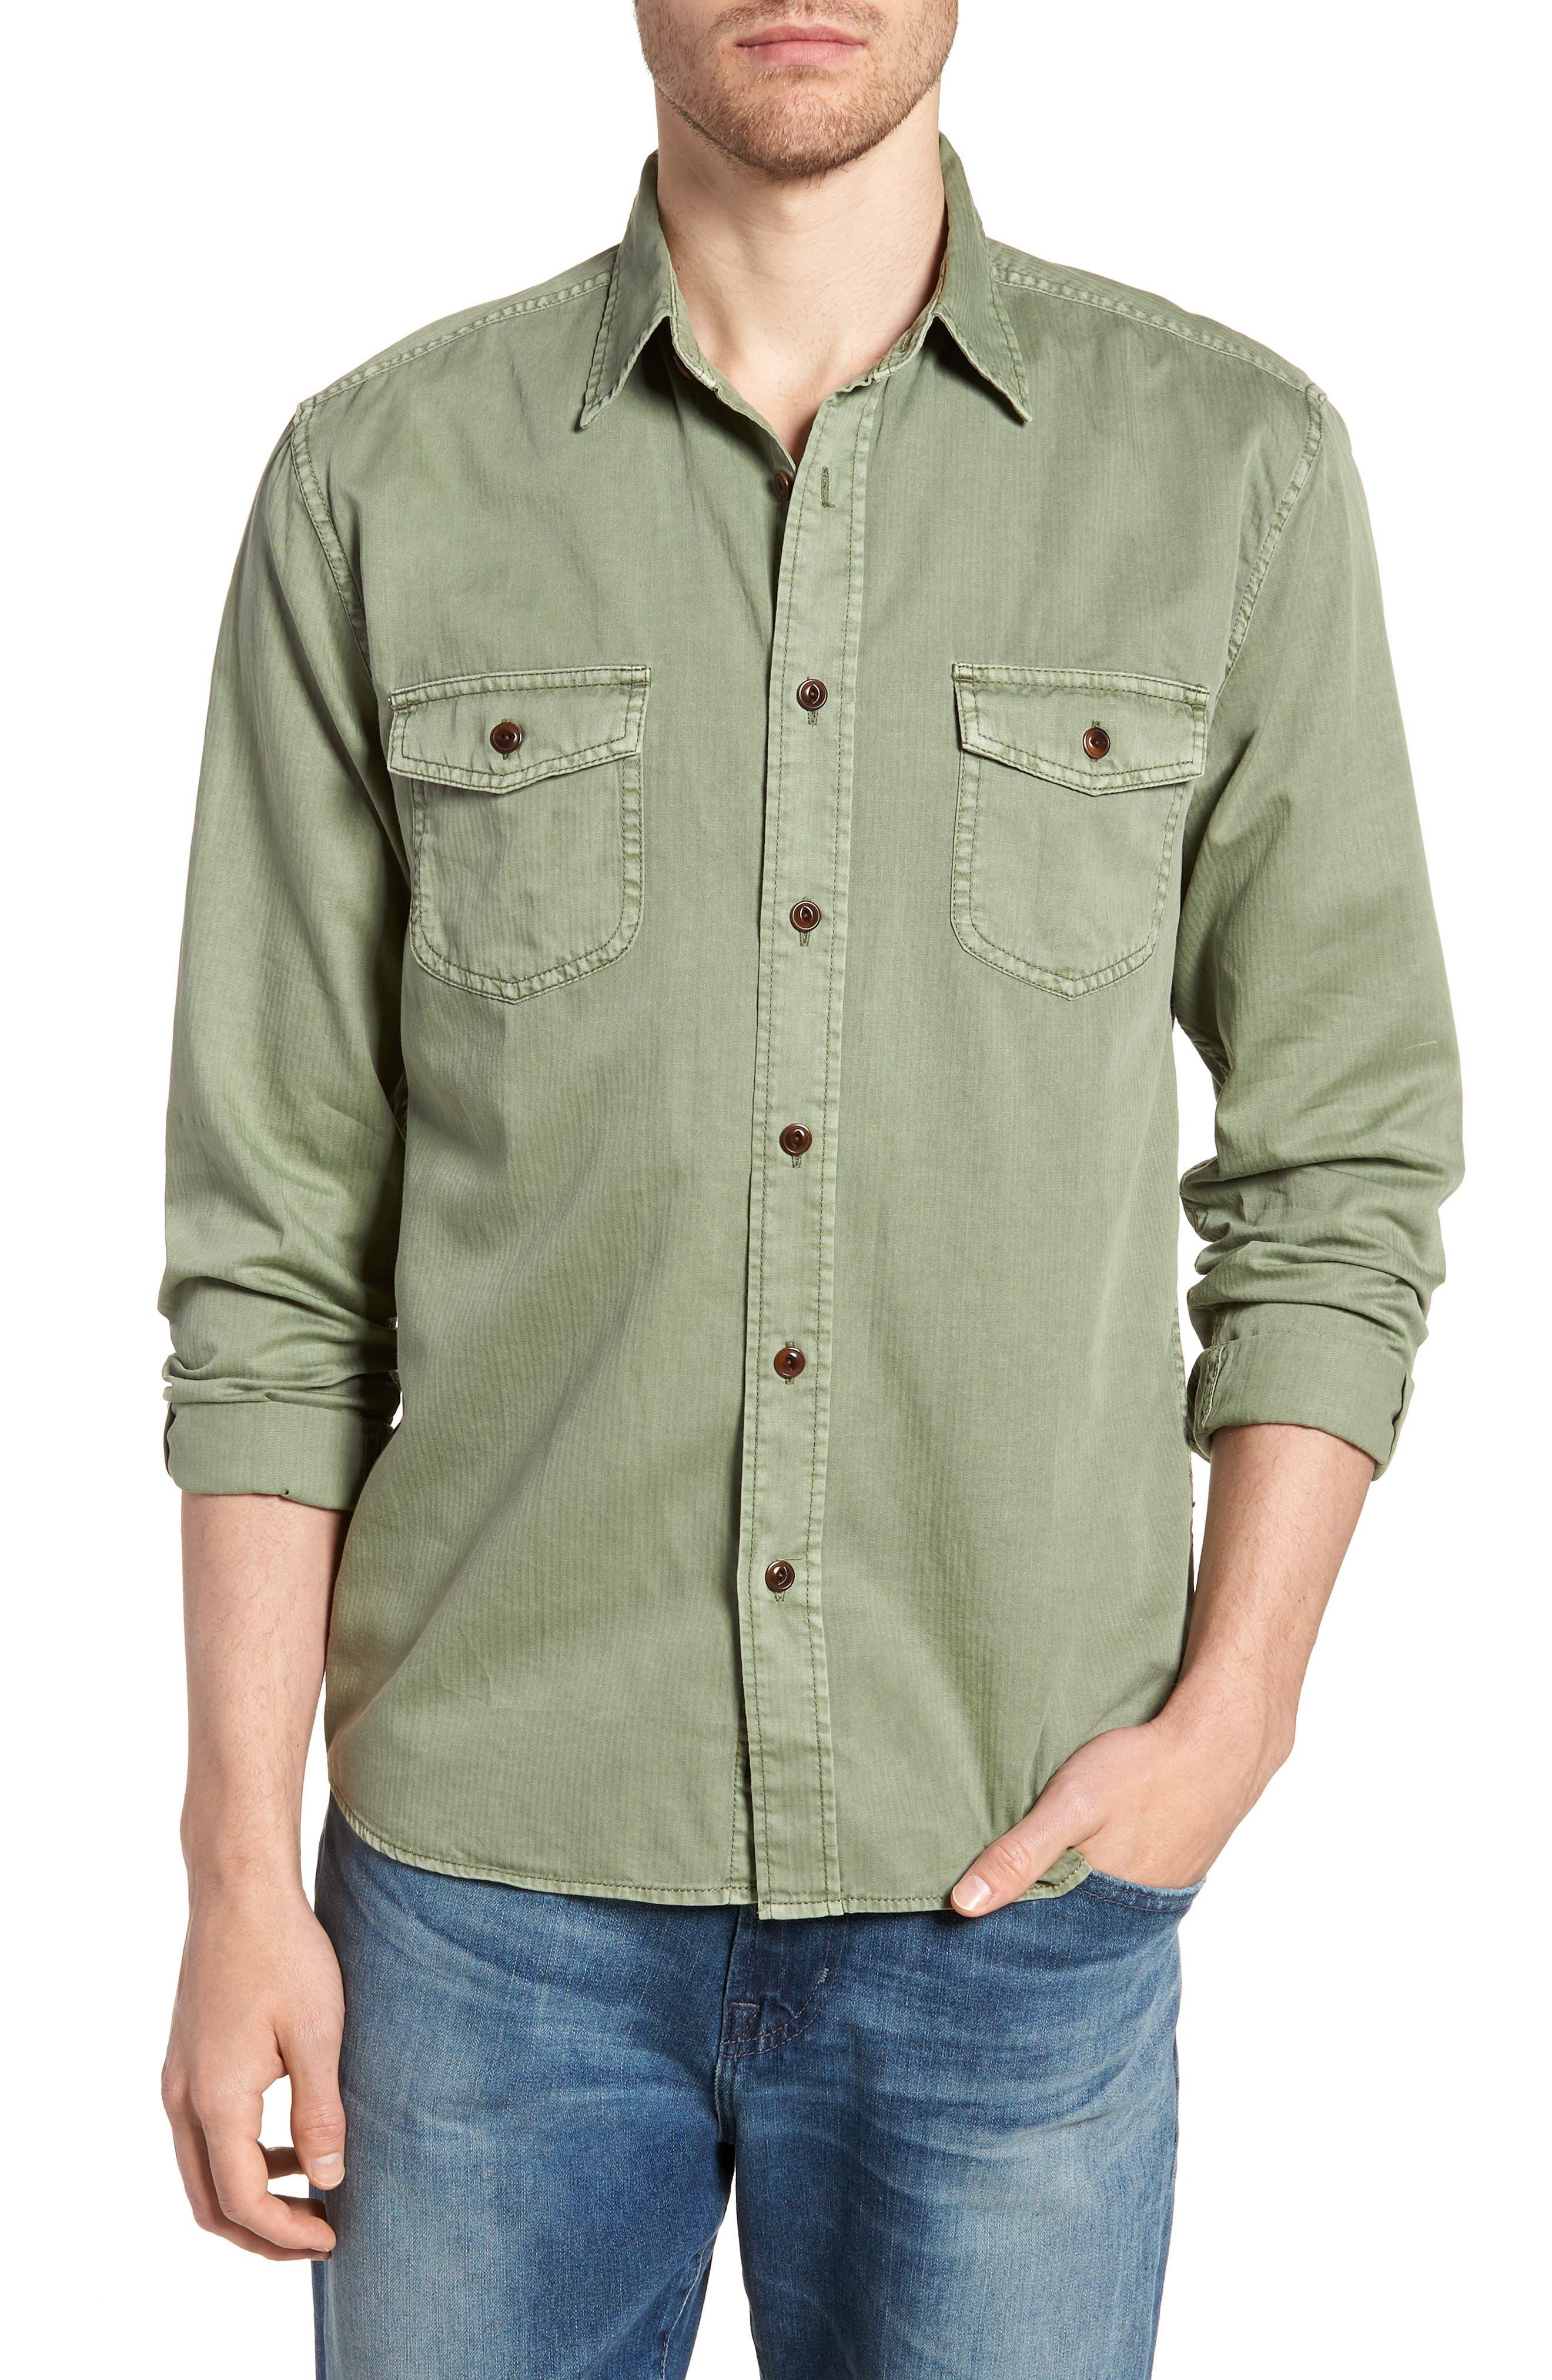 Radar Sport Shirt,                             Main thumbnail 1, color,                             Olive